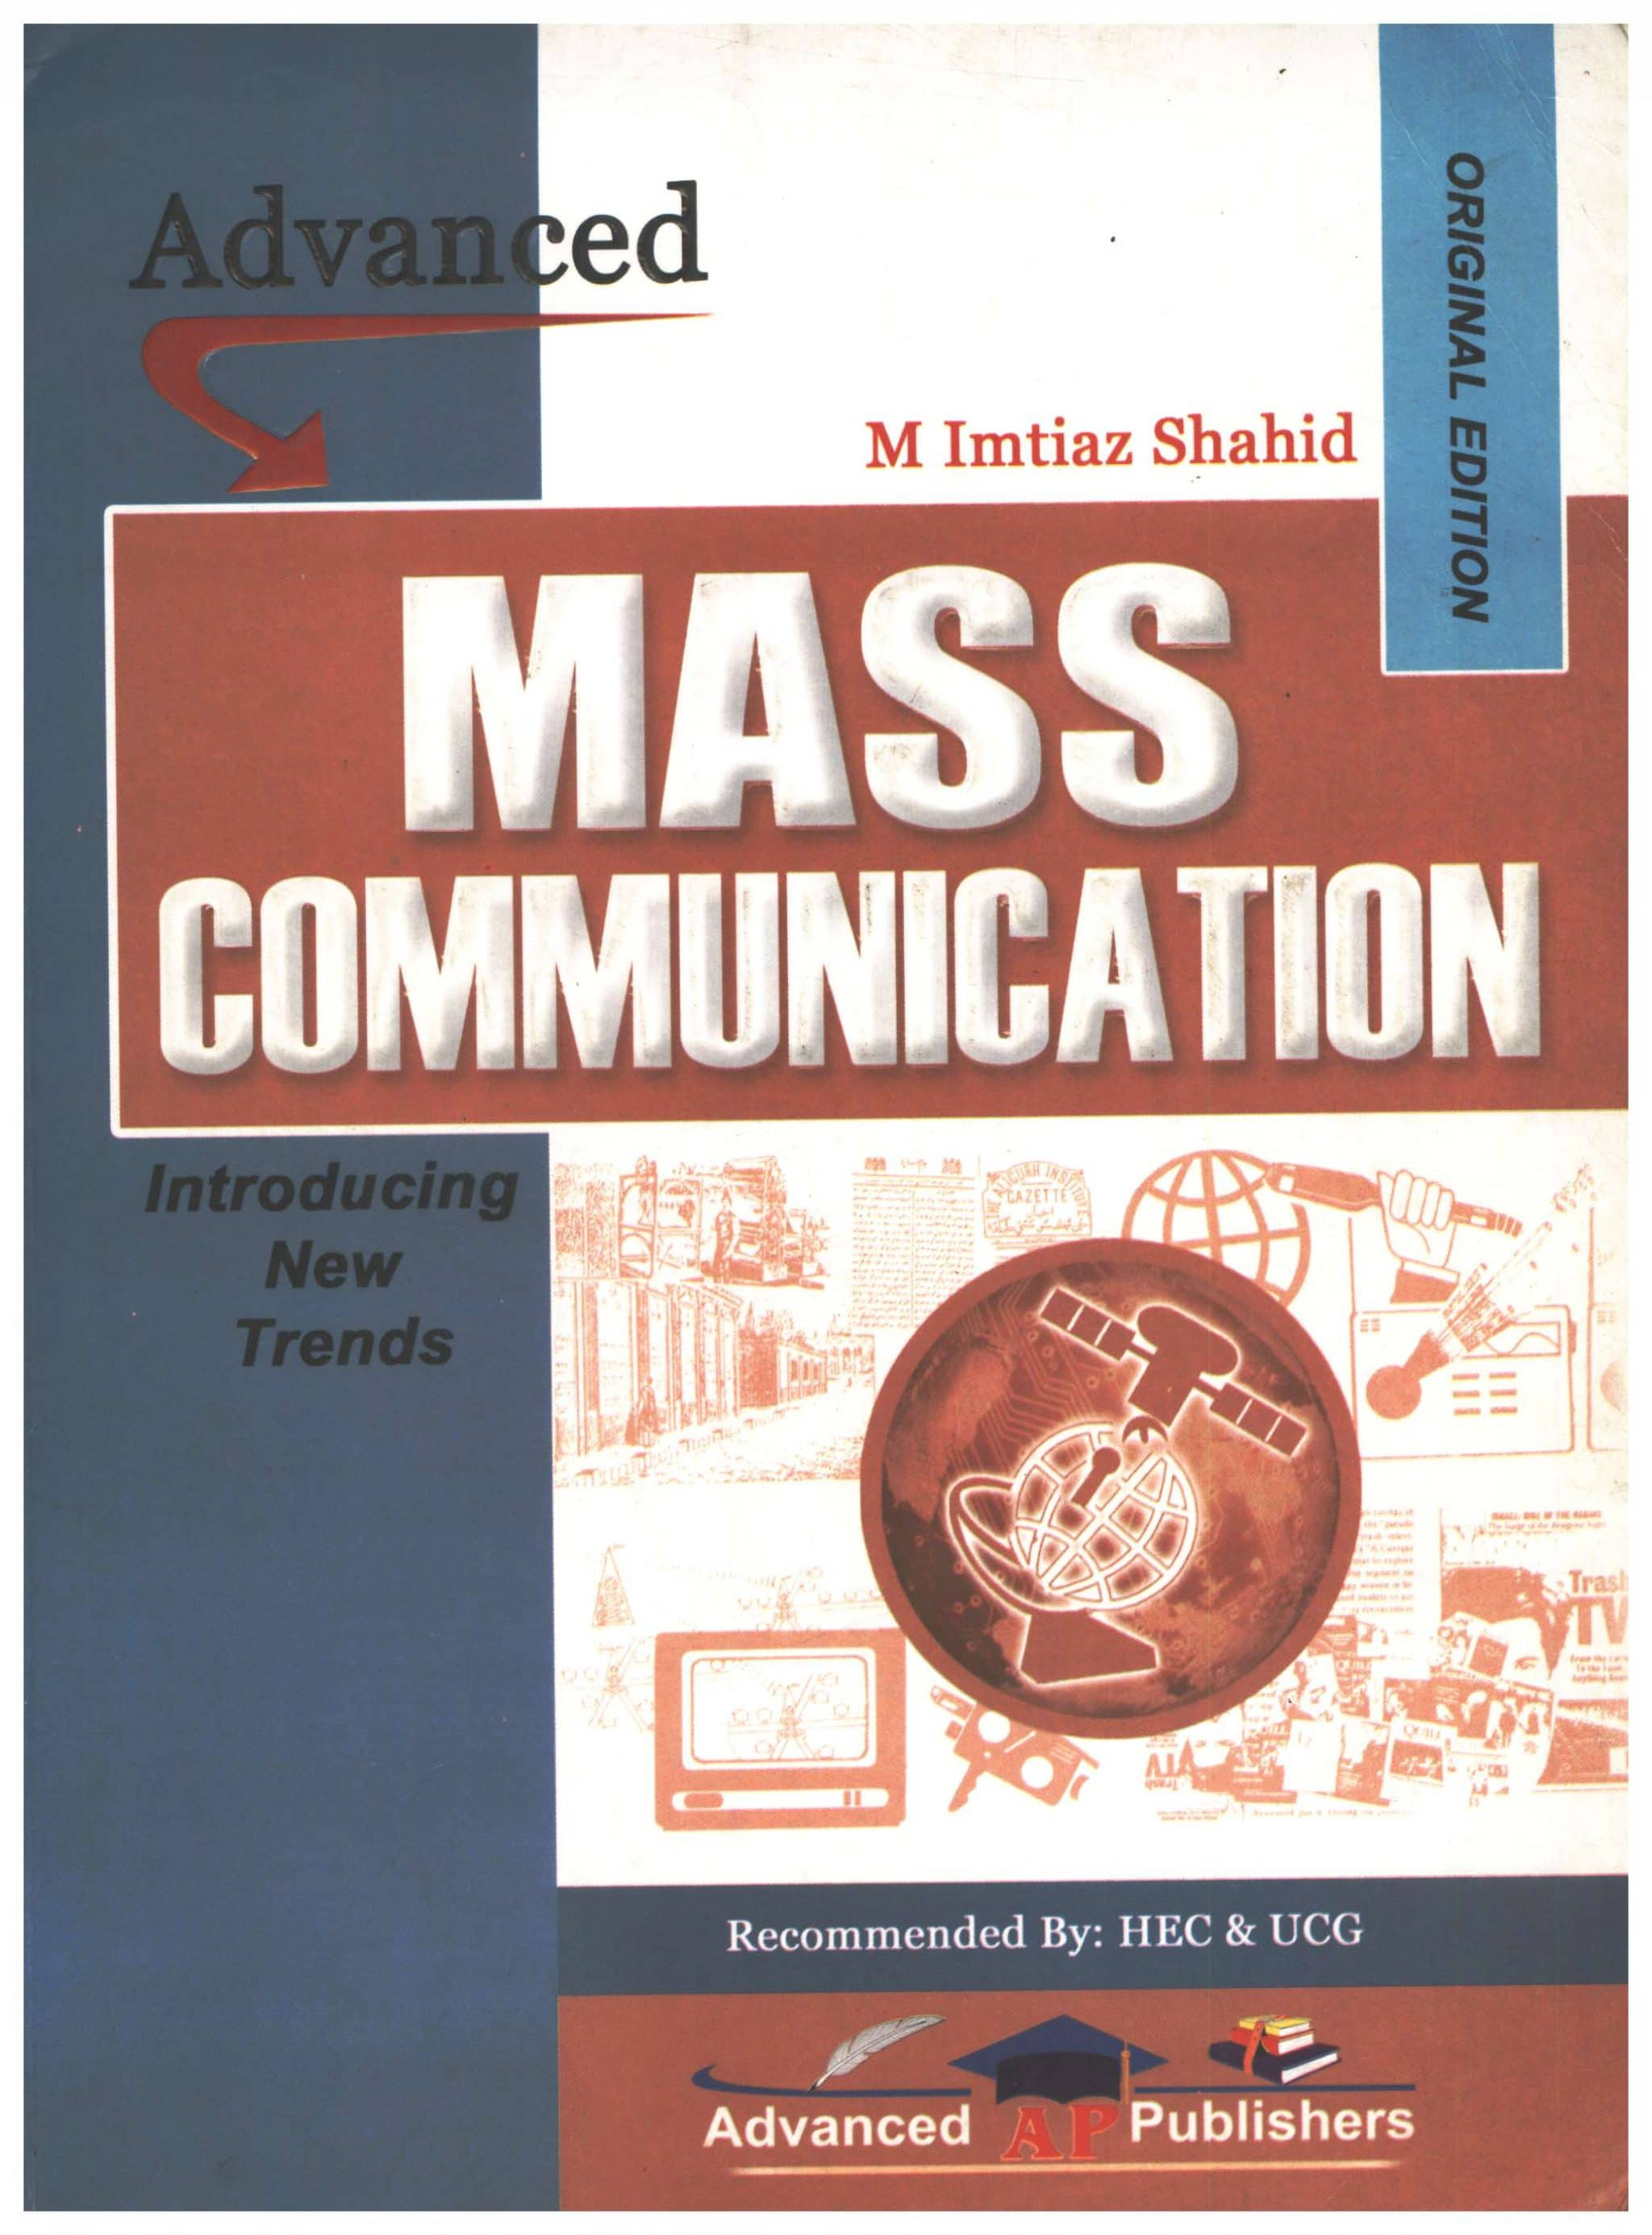 Mass Communication M. IMTIAZ SHAHID